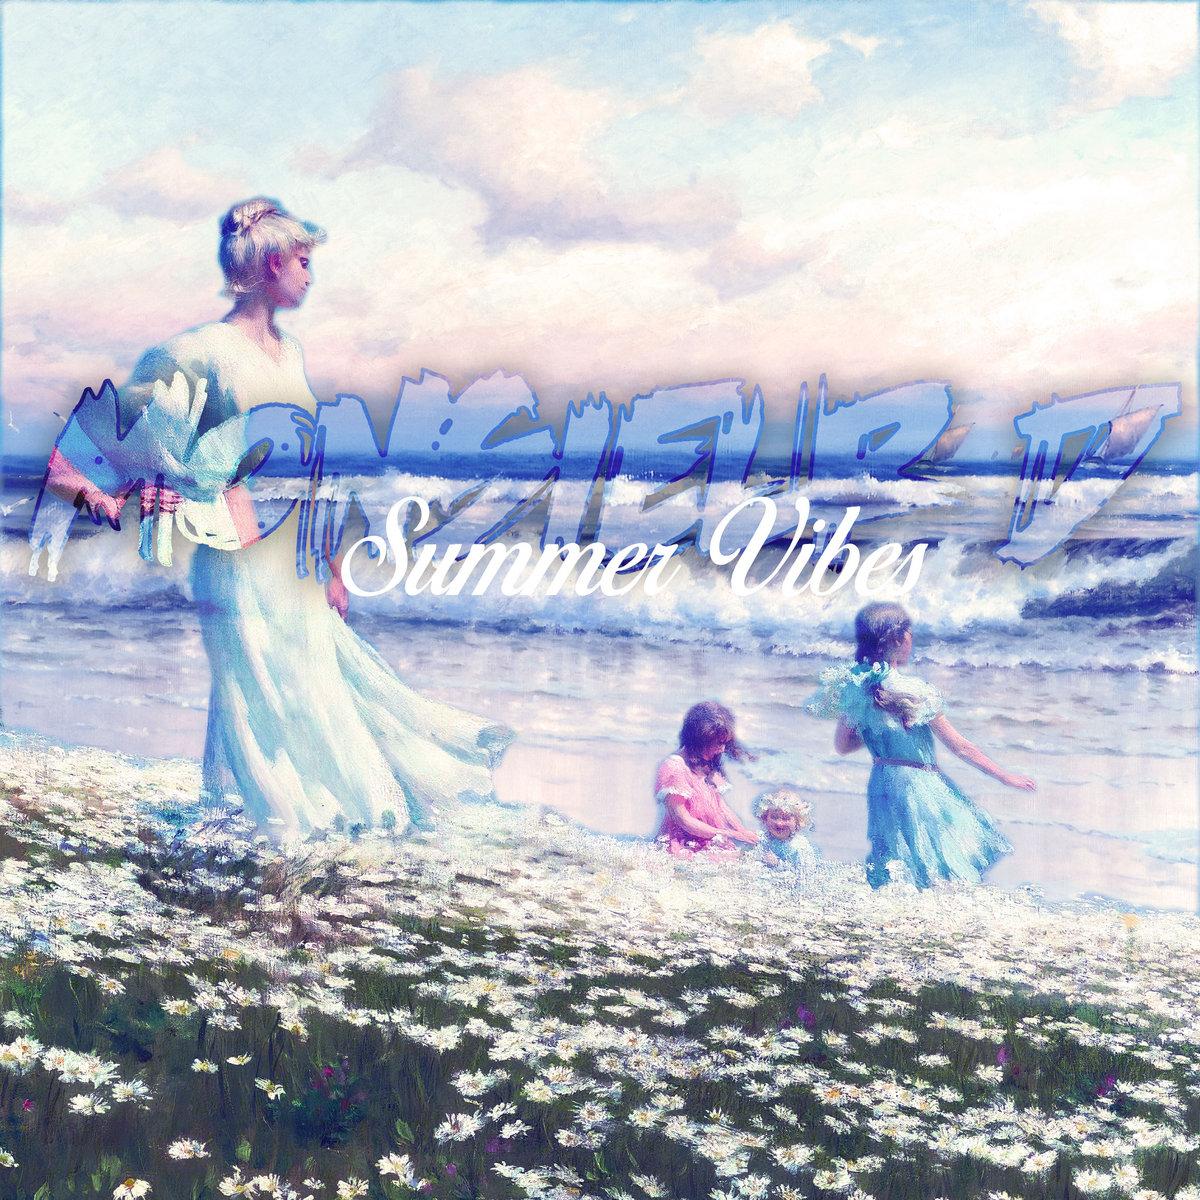 Summer Vibes by Monsieur D